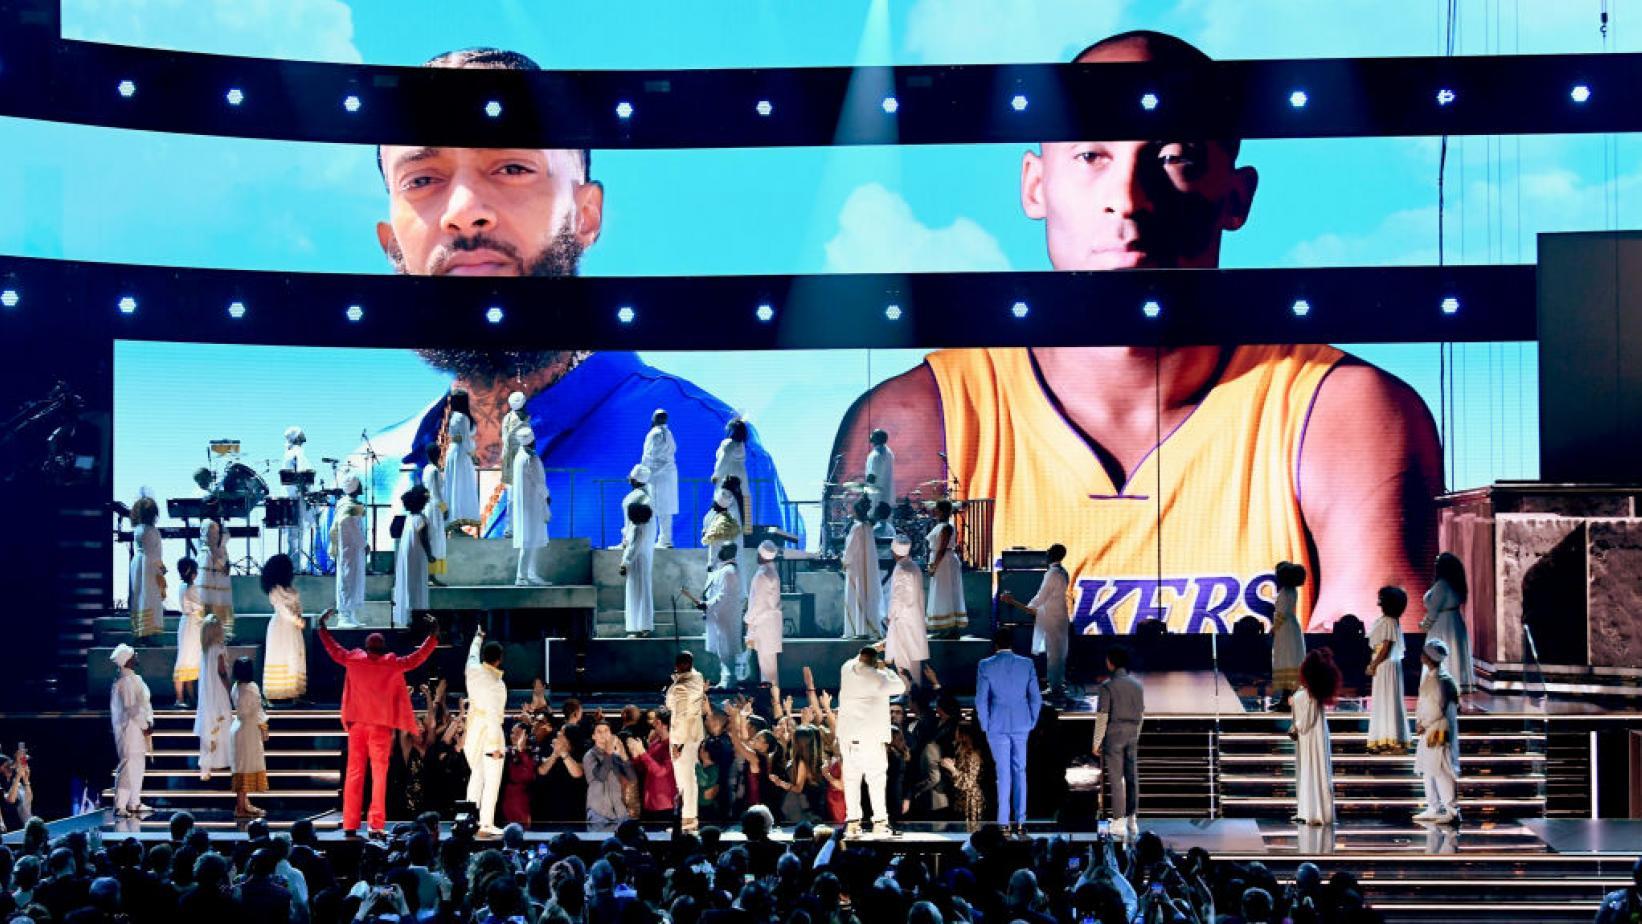 Grammys 2020 Nipsey Hussle Tribute